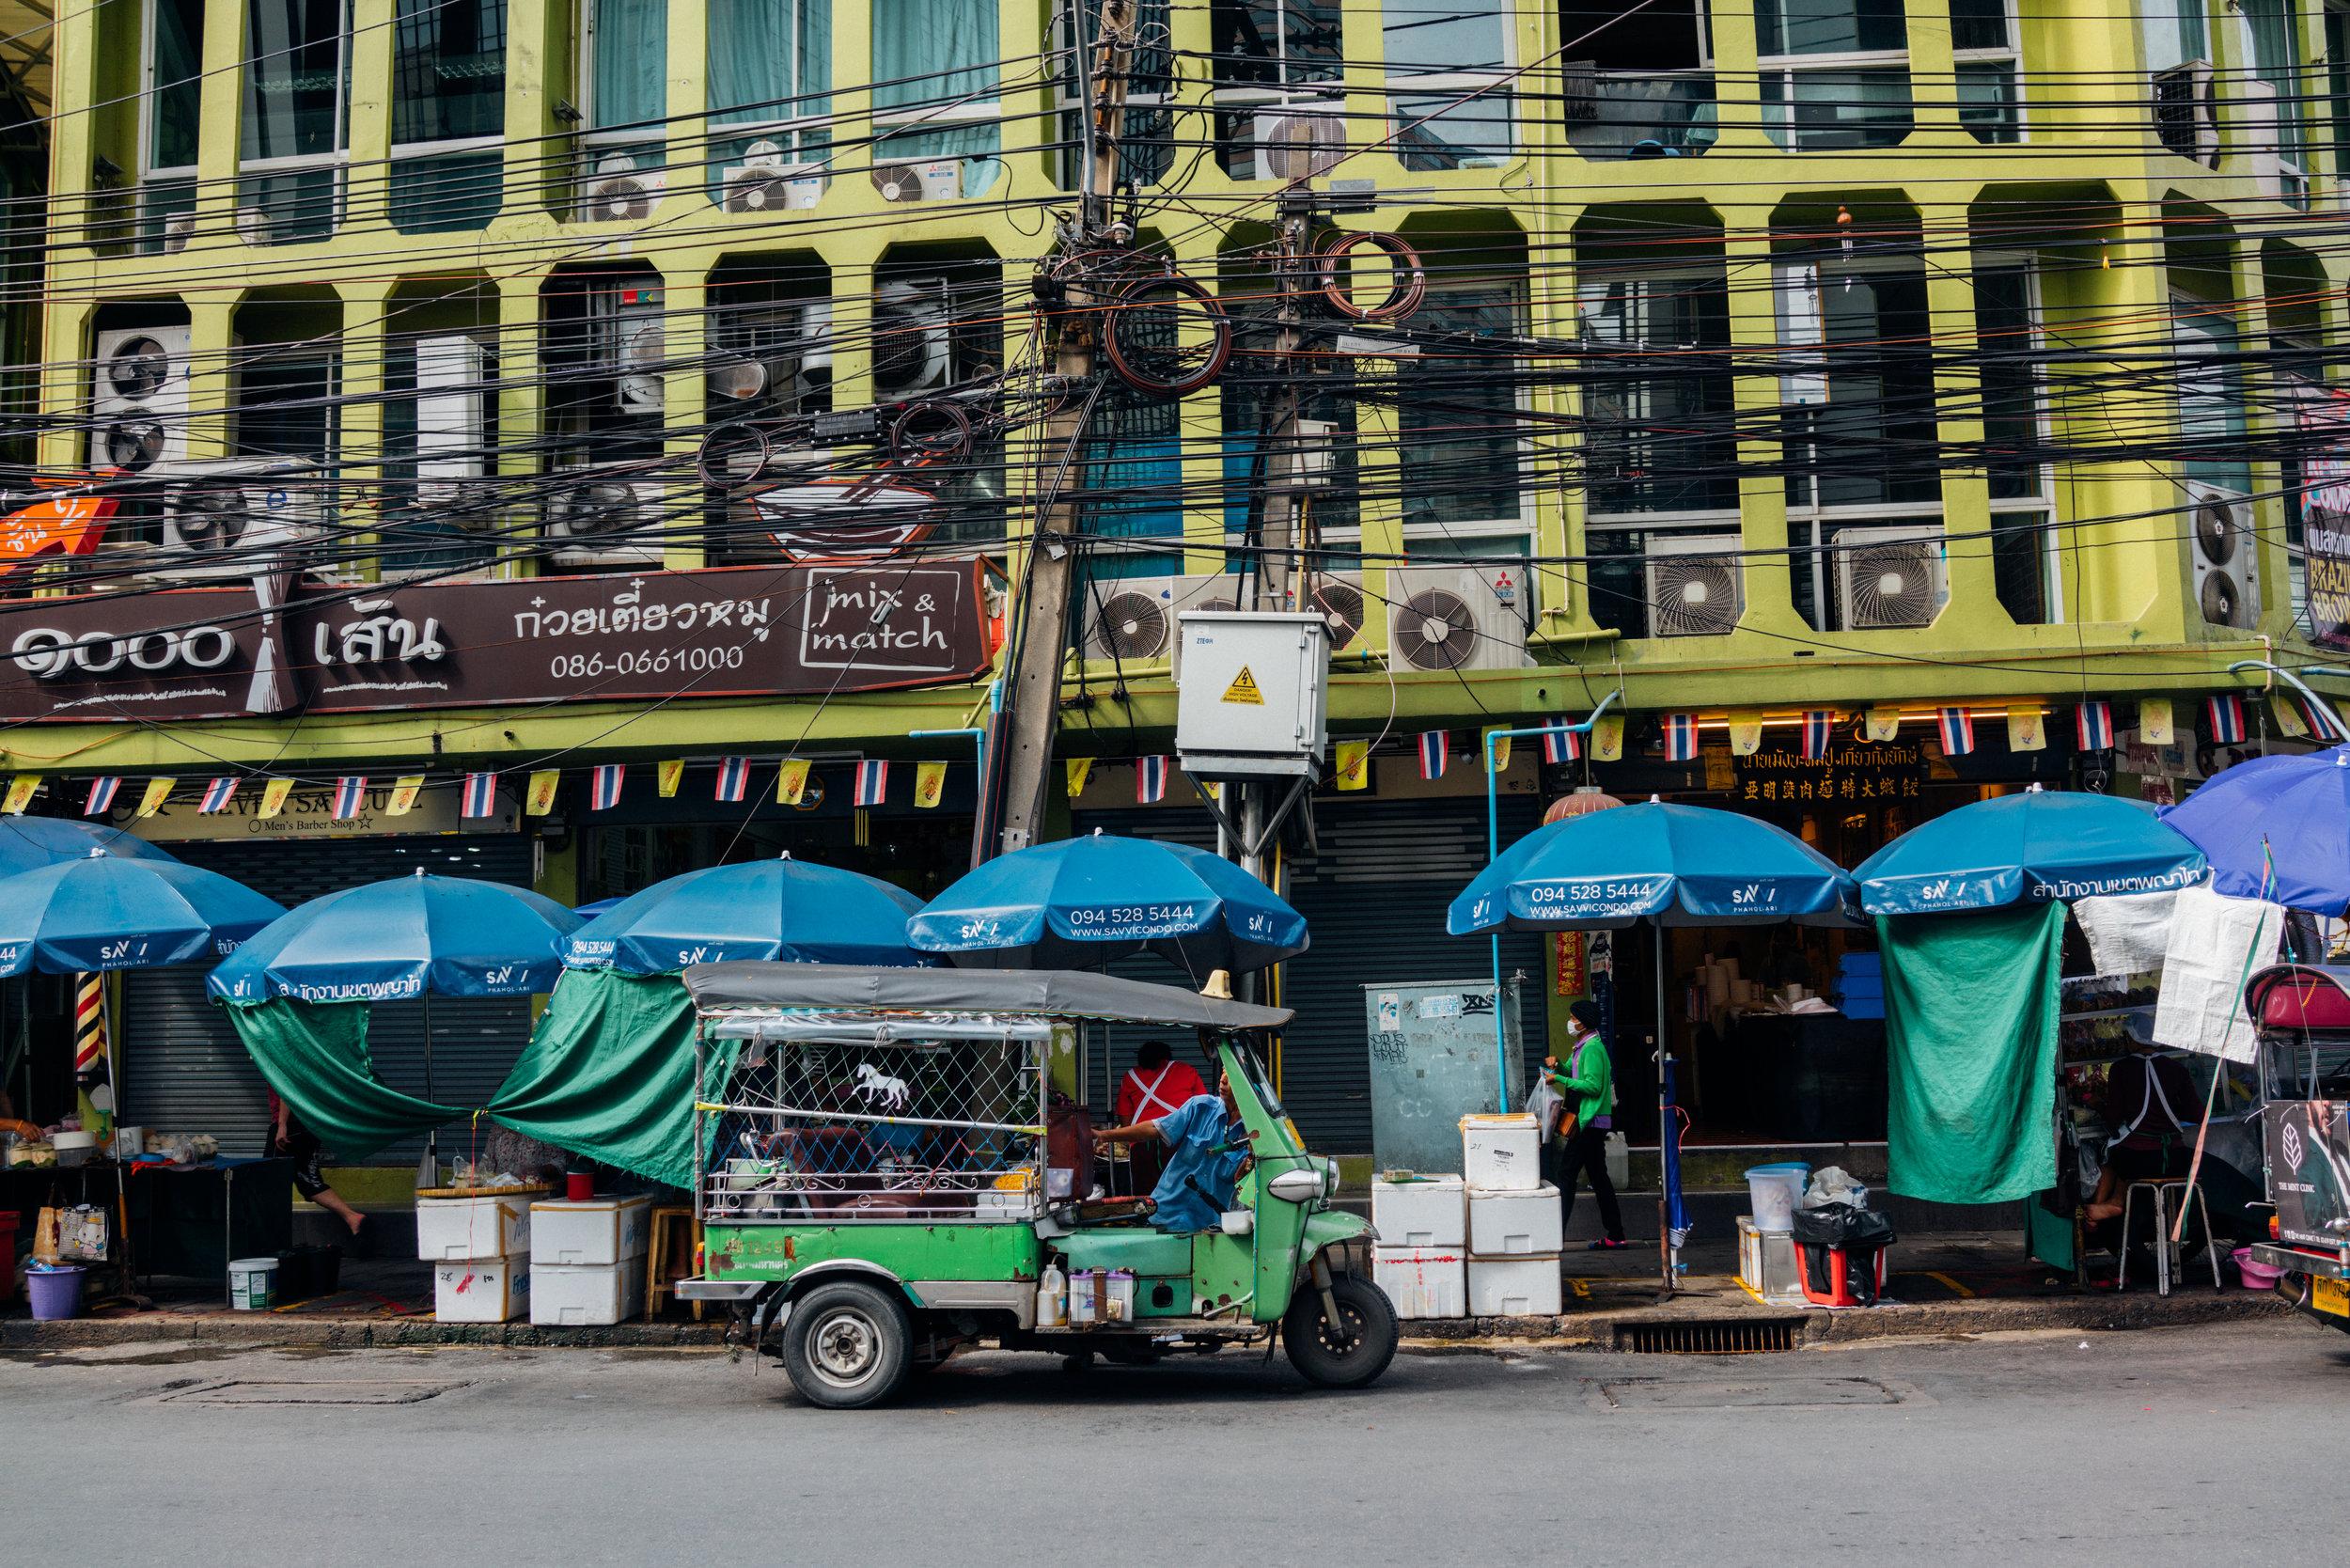 A street in Ari, the neighborhood we stayed in while in Bangkok